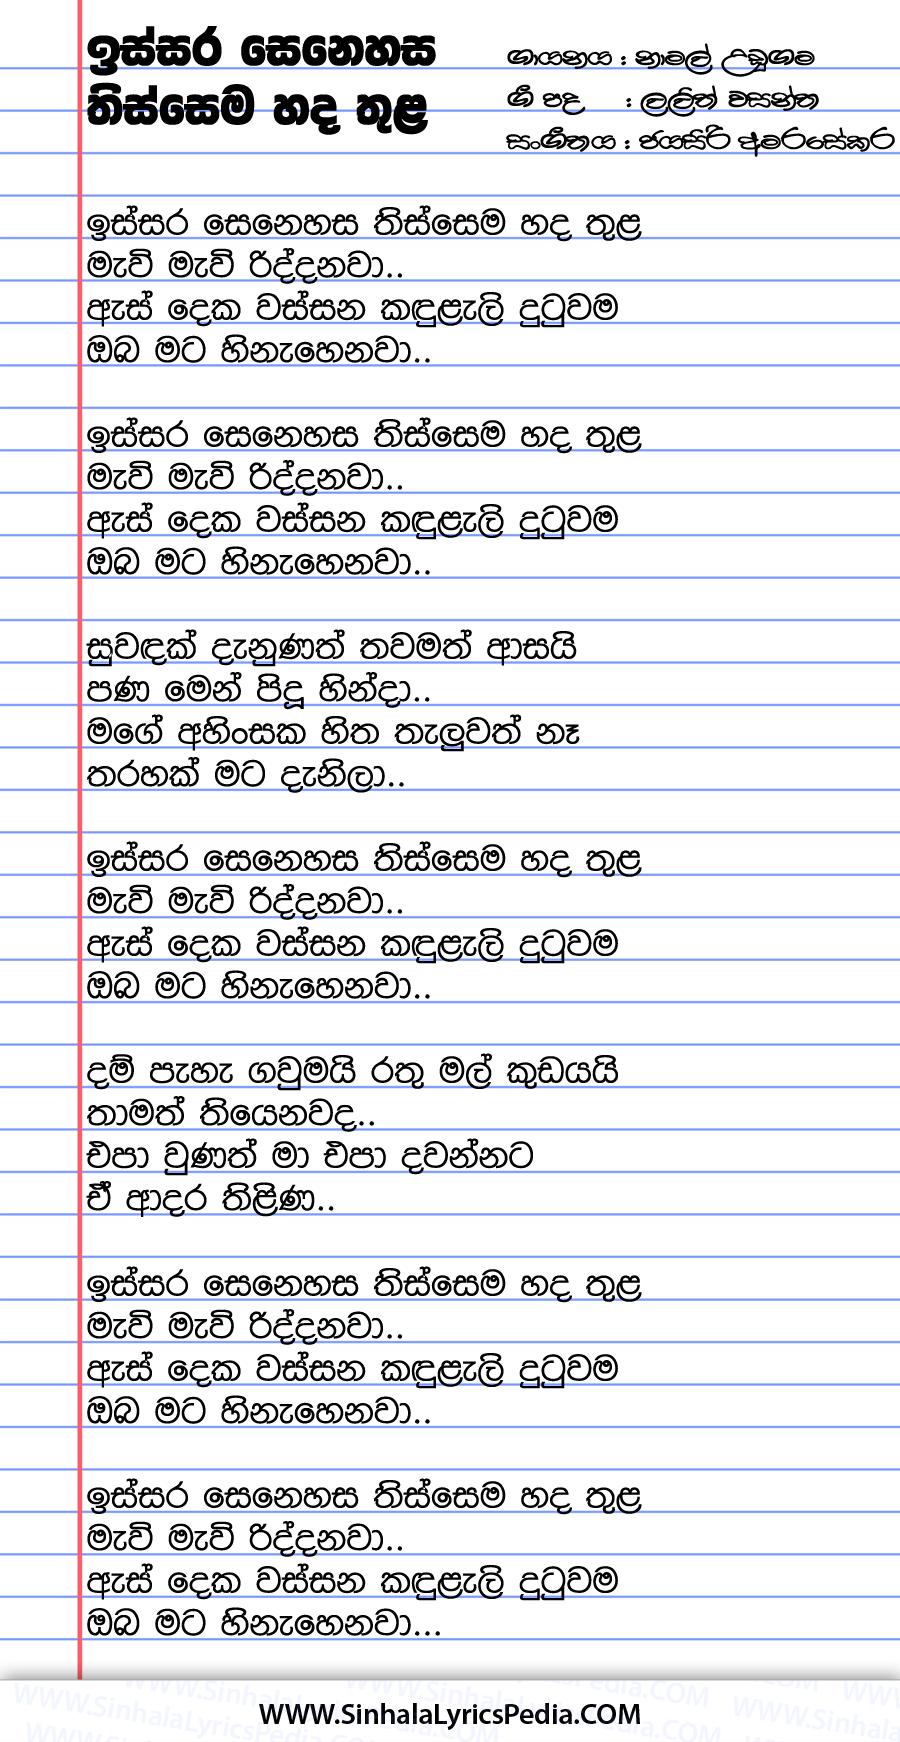 Issara Senehasa Thissema Hada Thula Song Lyrics